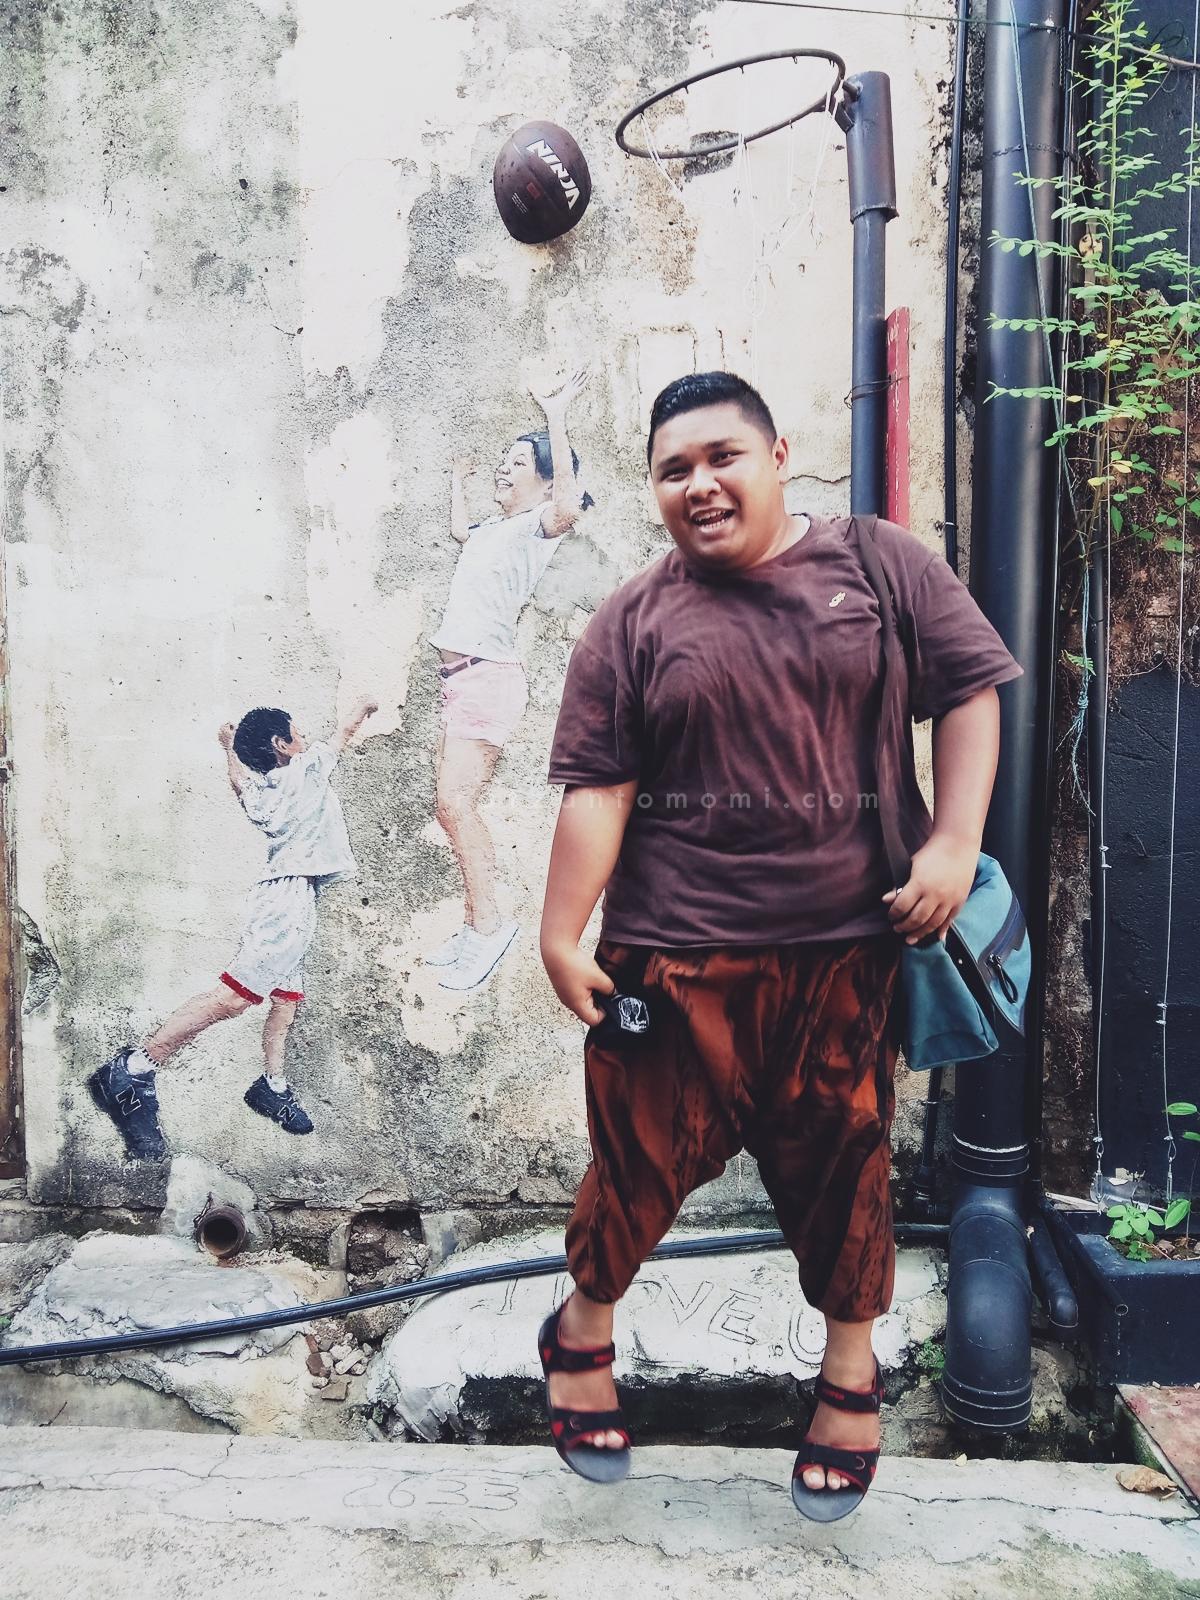 Gambar Menarik Di Street Art Pulau Pinang